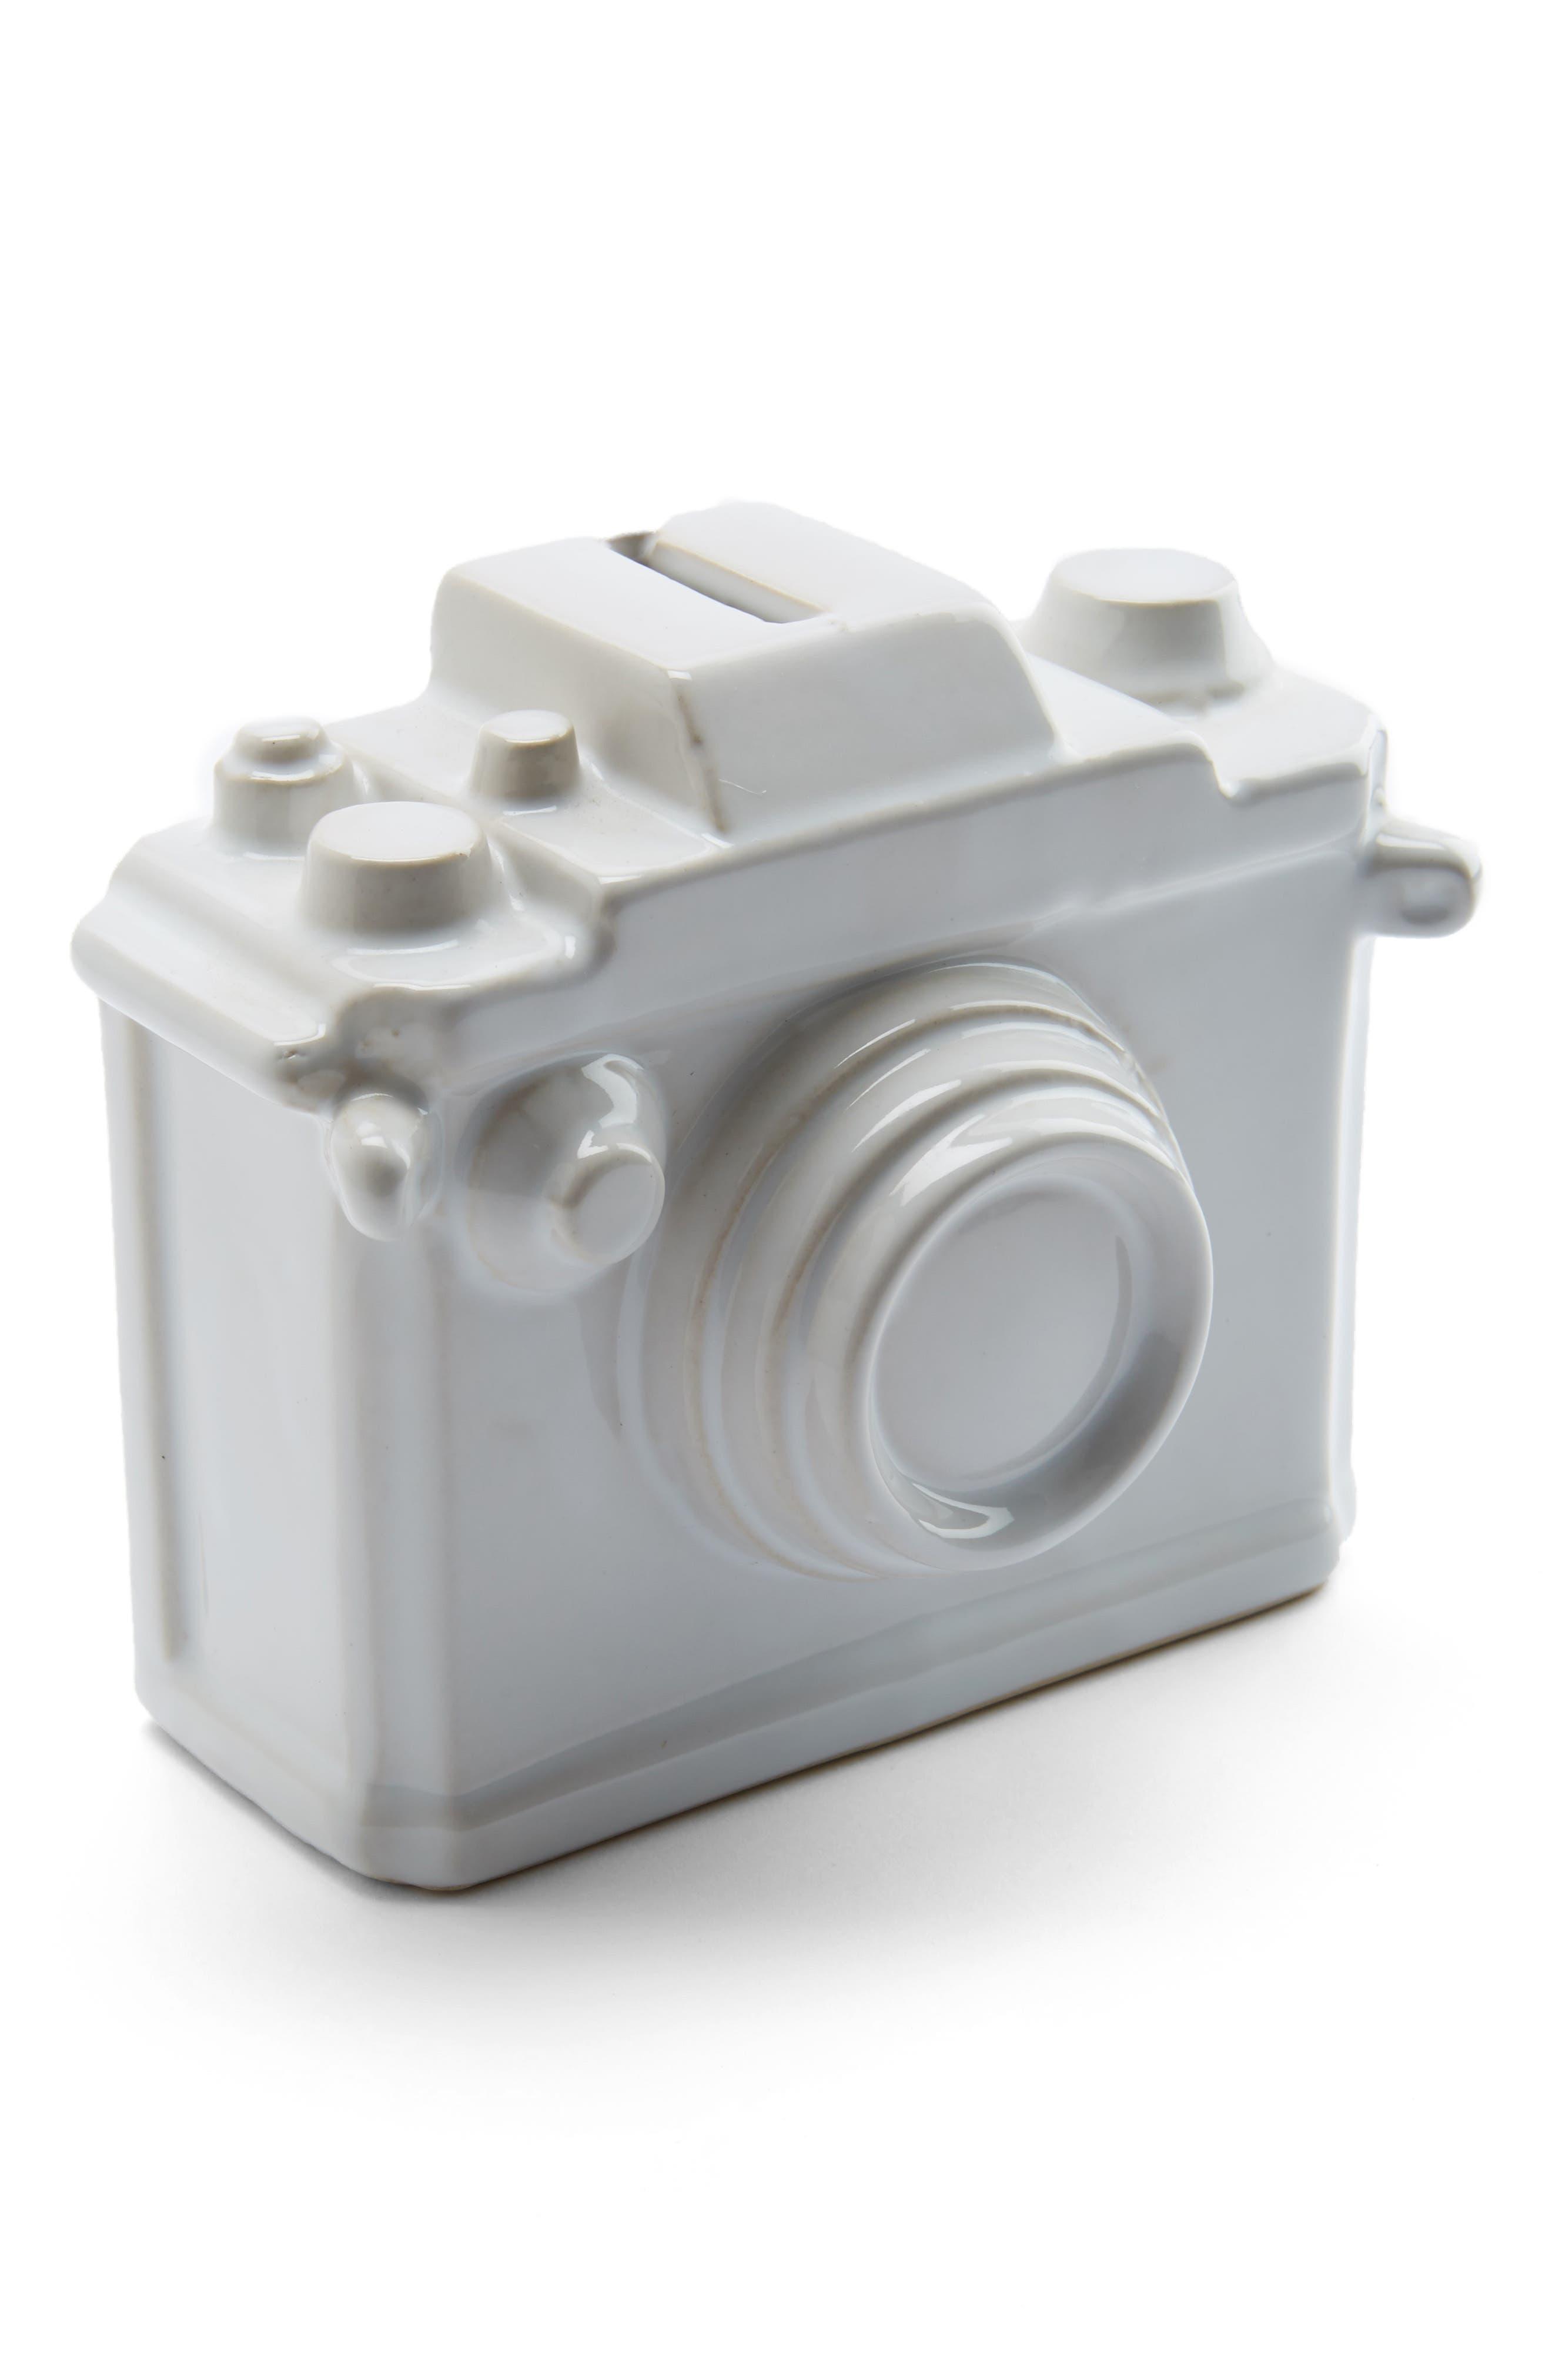 Main Image - HomArt Camera Ceramic Bank